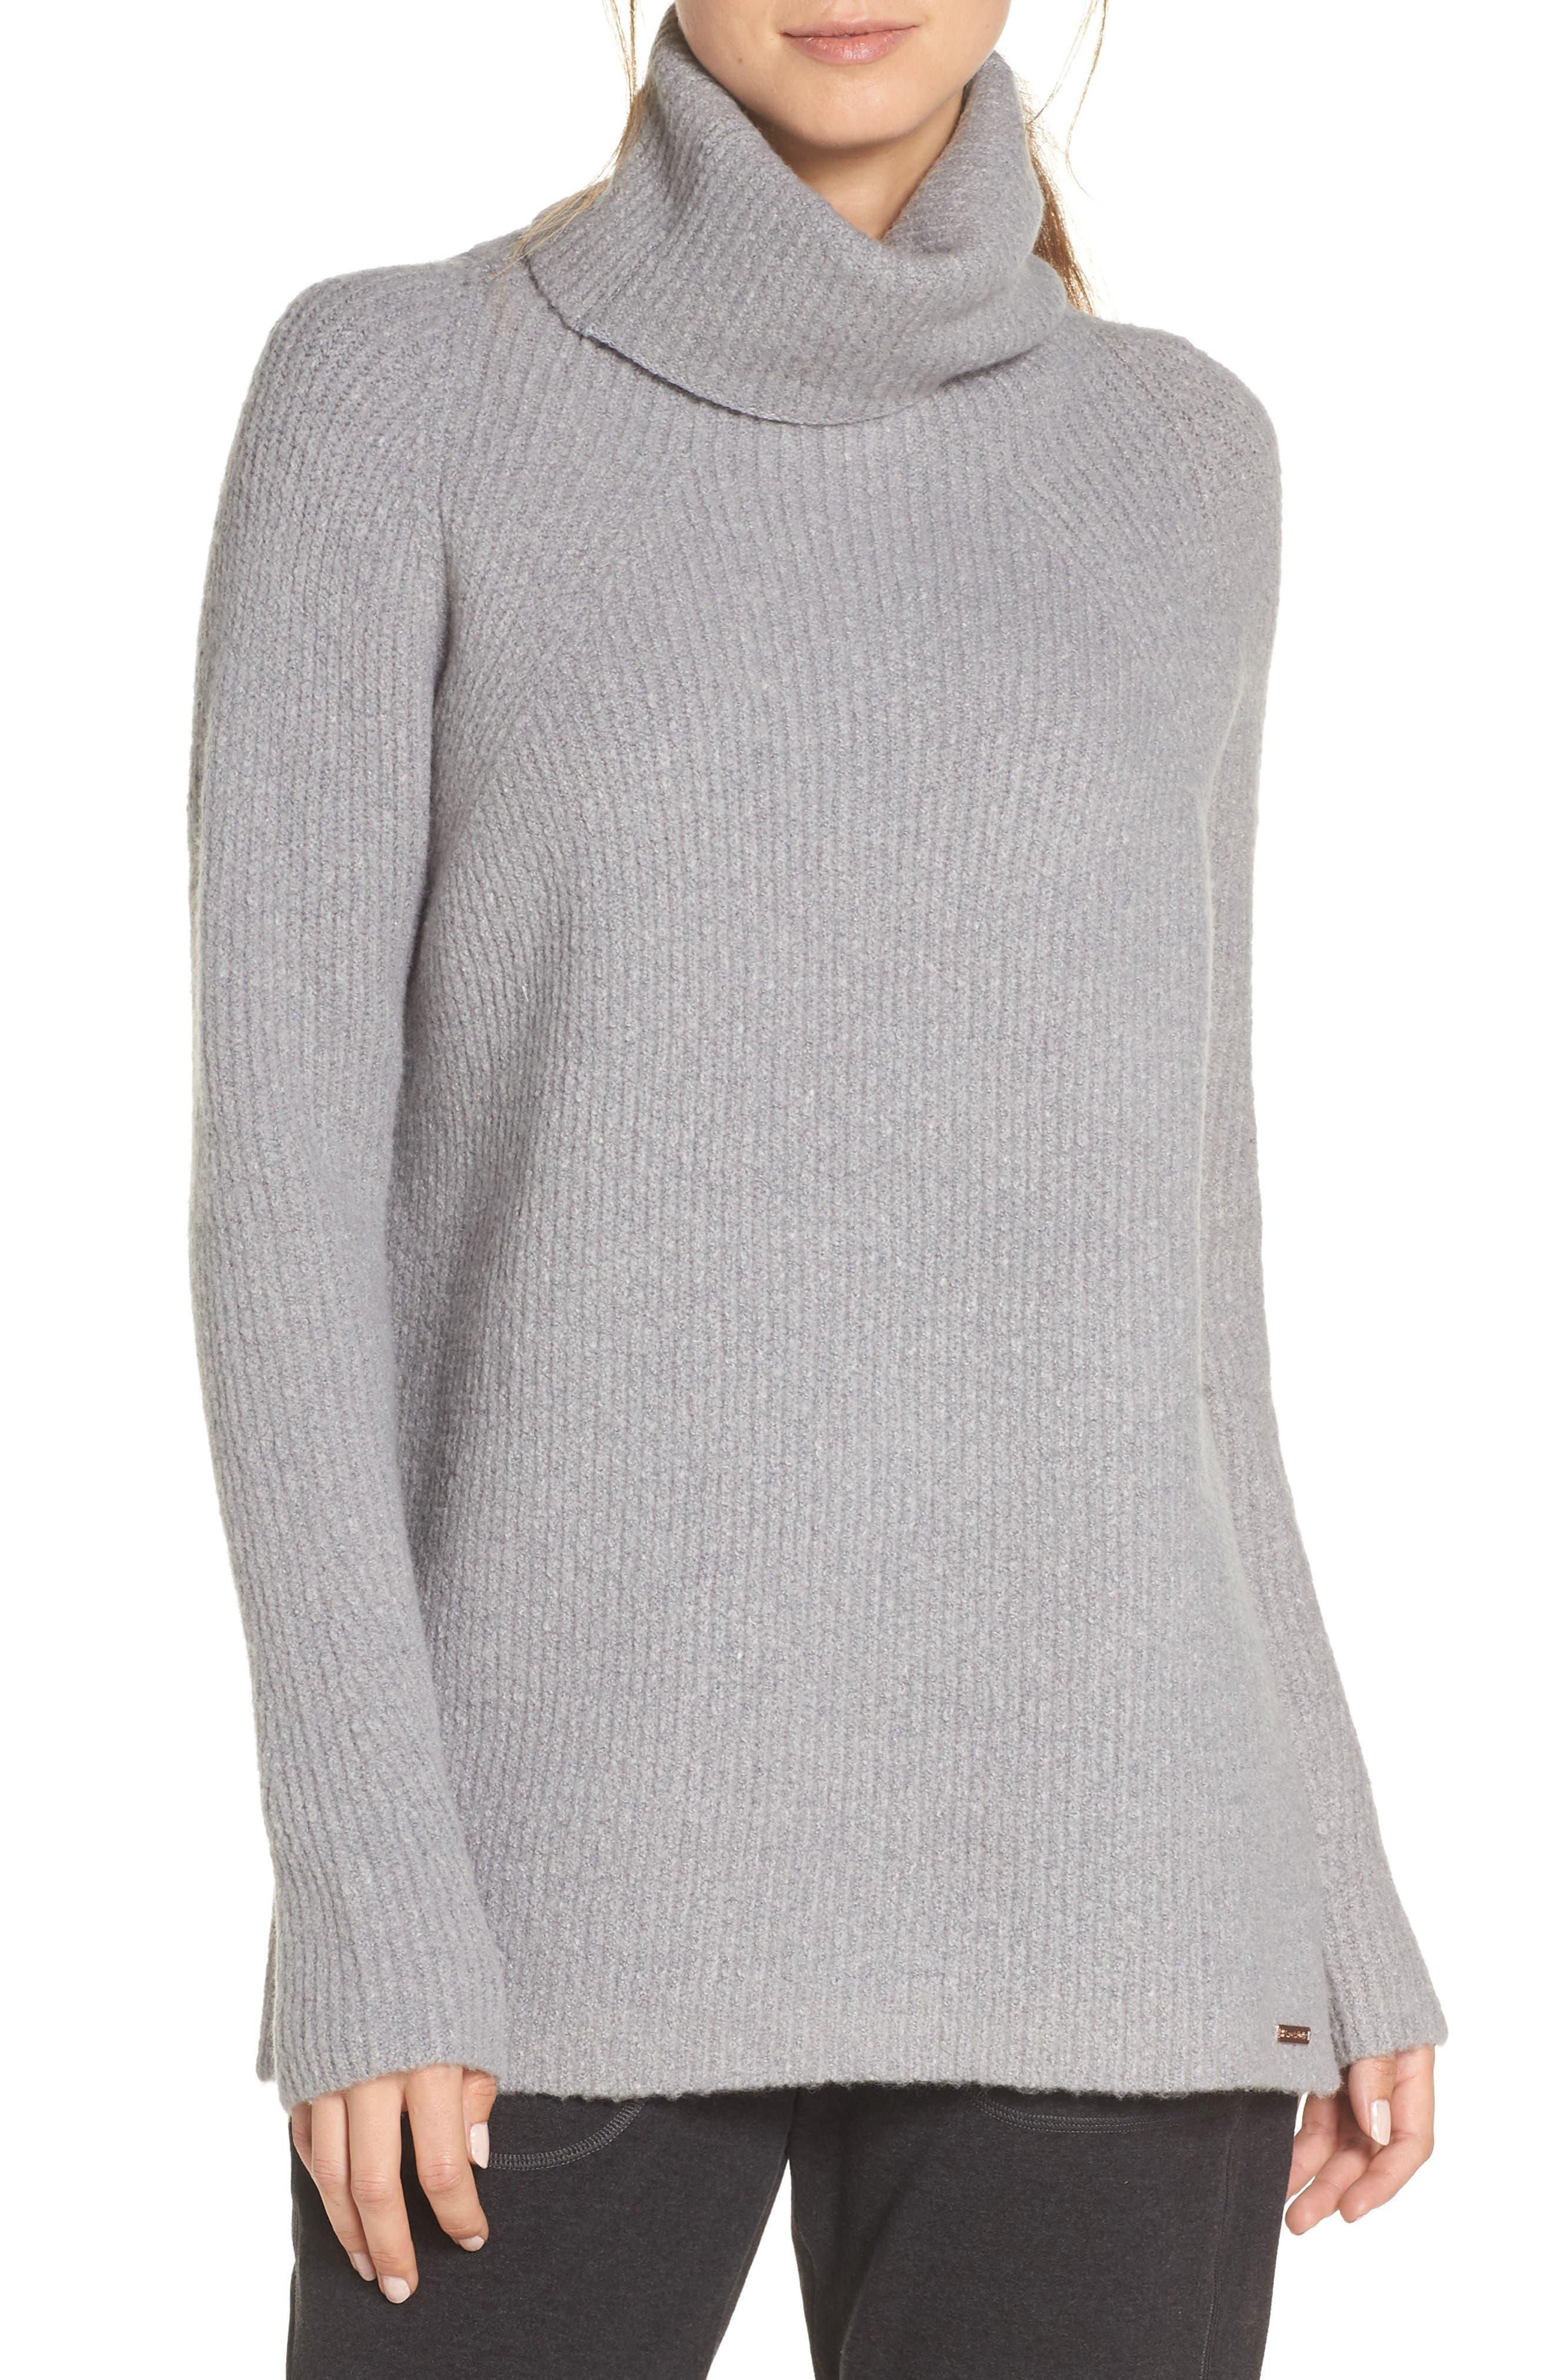 Shakti Oversize Sweater,                             Main thumbnail 1, color,                             SILVER GREY MARL